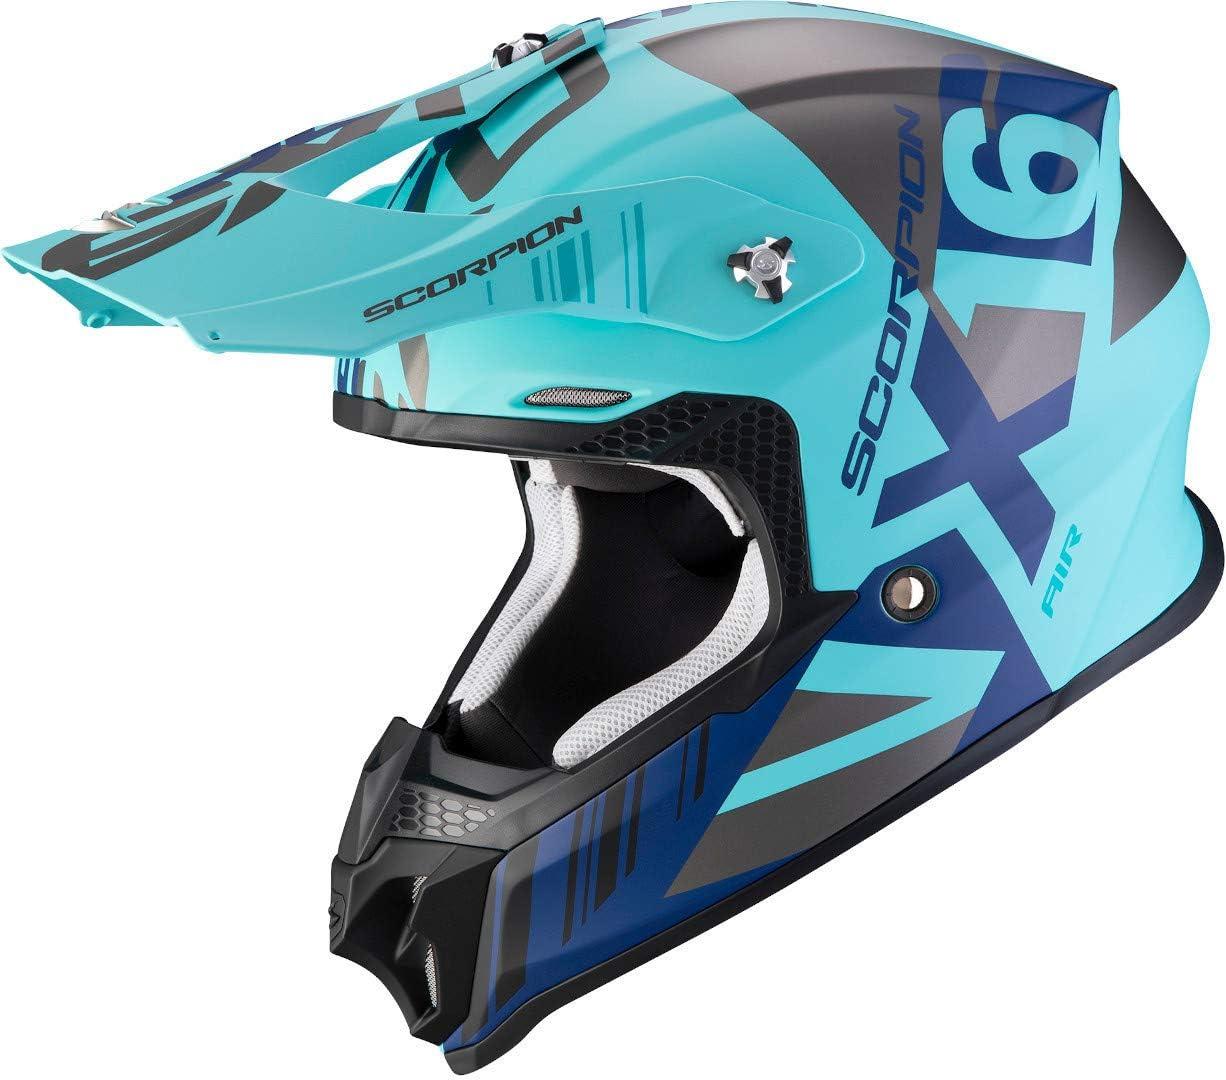 Mejor casco Motocros Scorpion